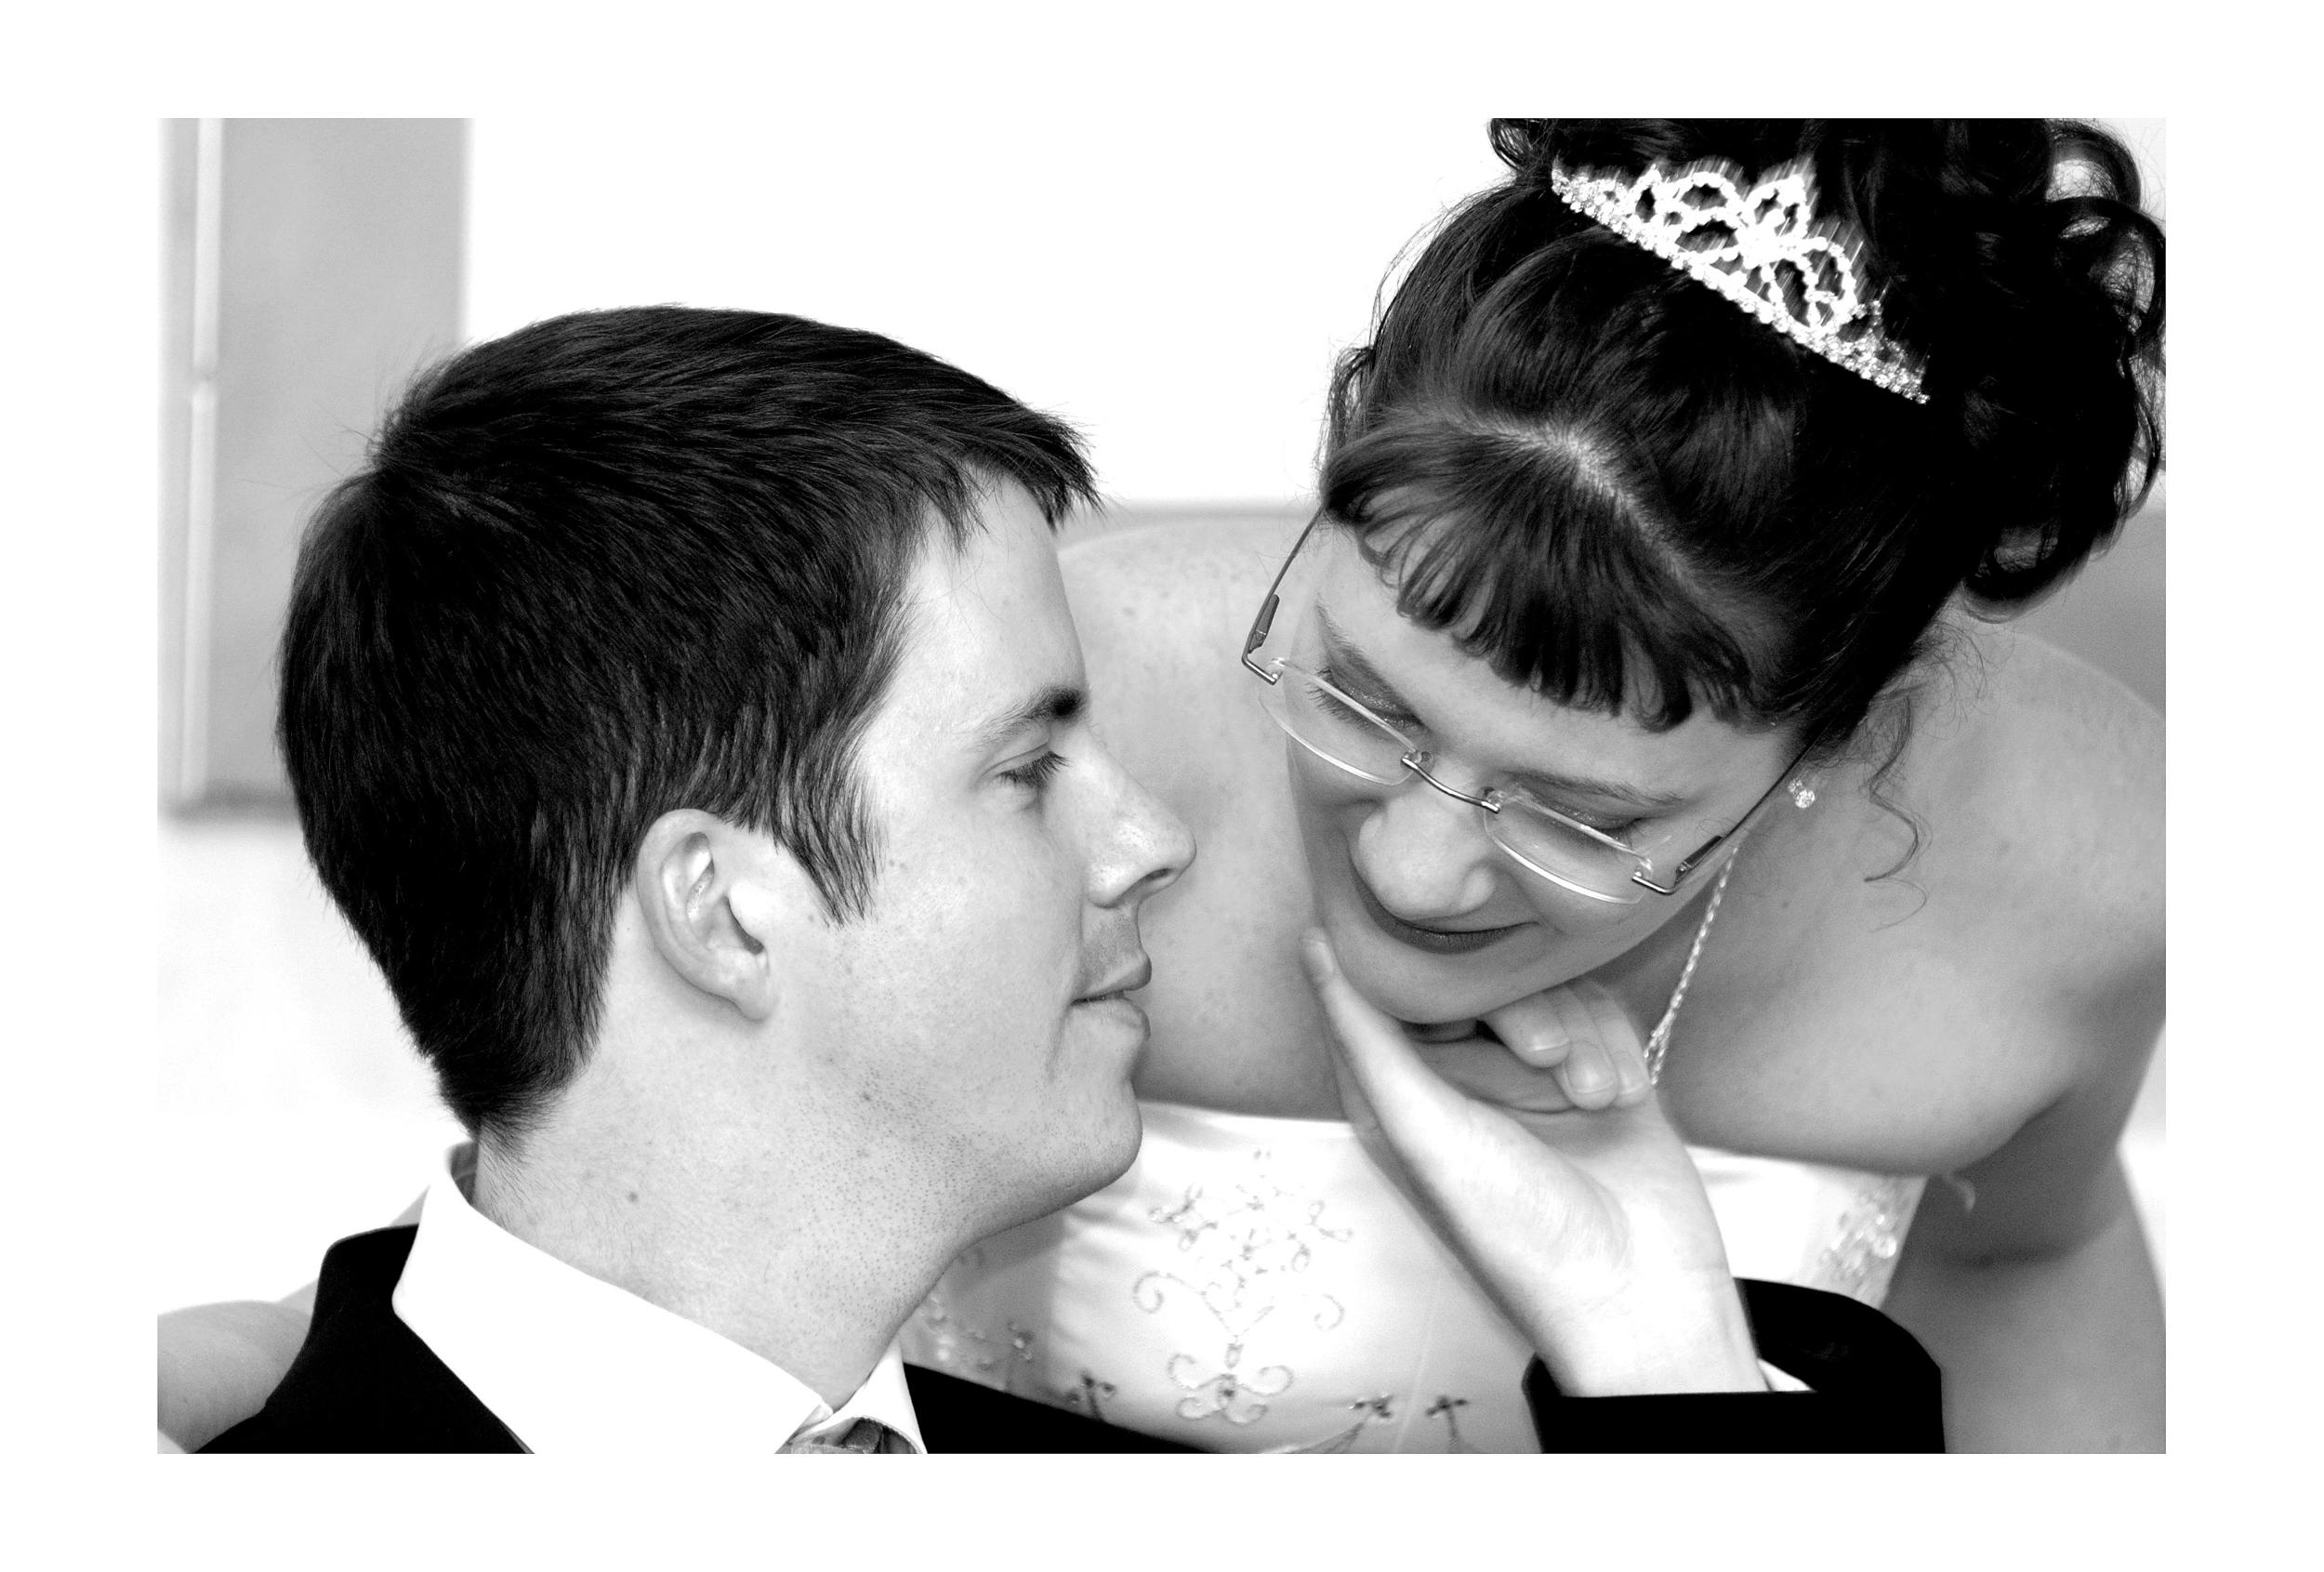 REPORTAGE-WEDDING-PHOTOGRAPHY-SET-UK-73.jpg